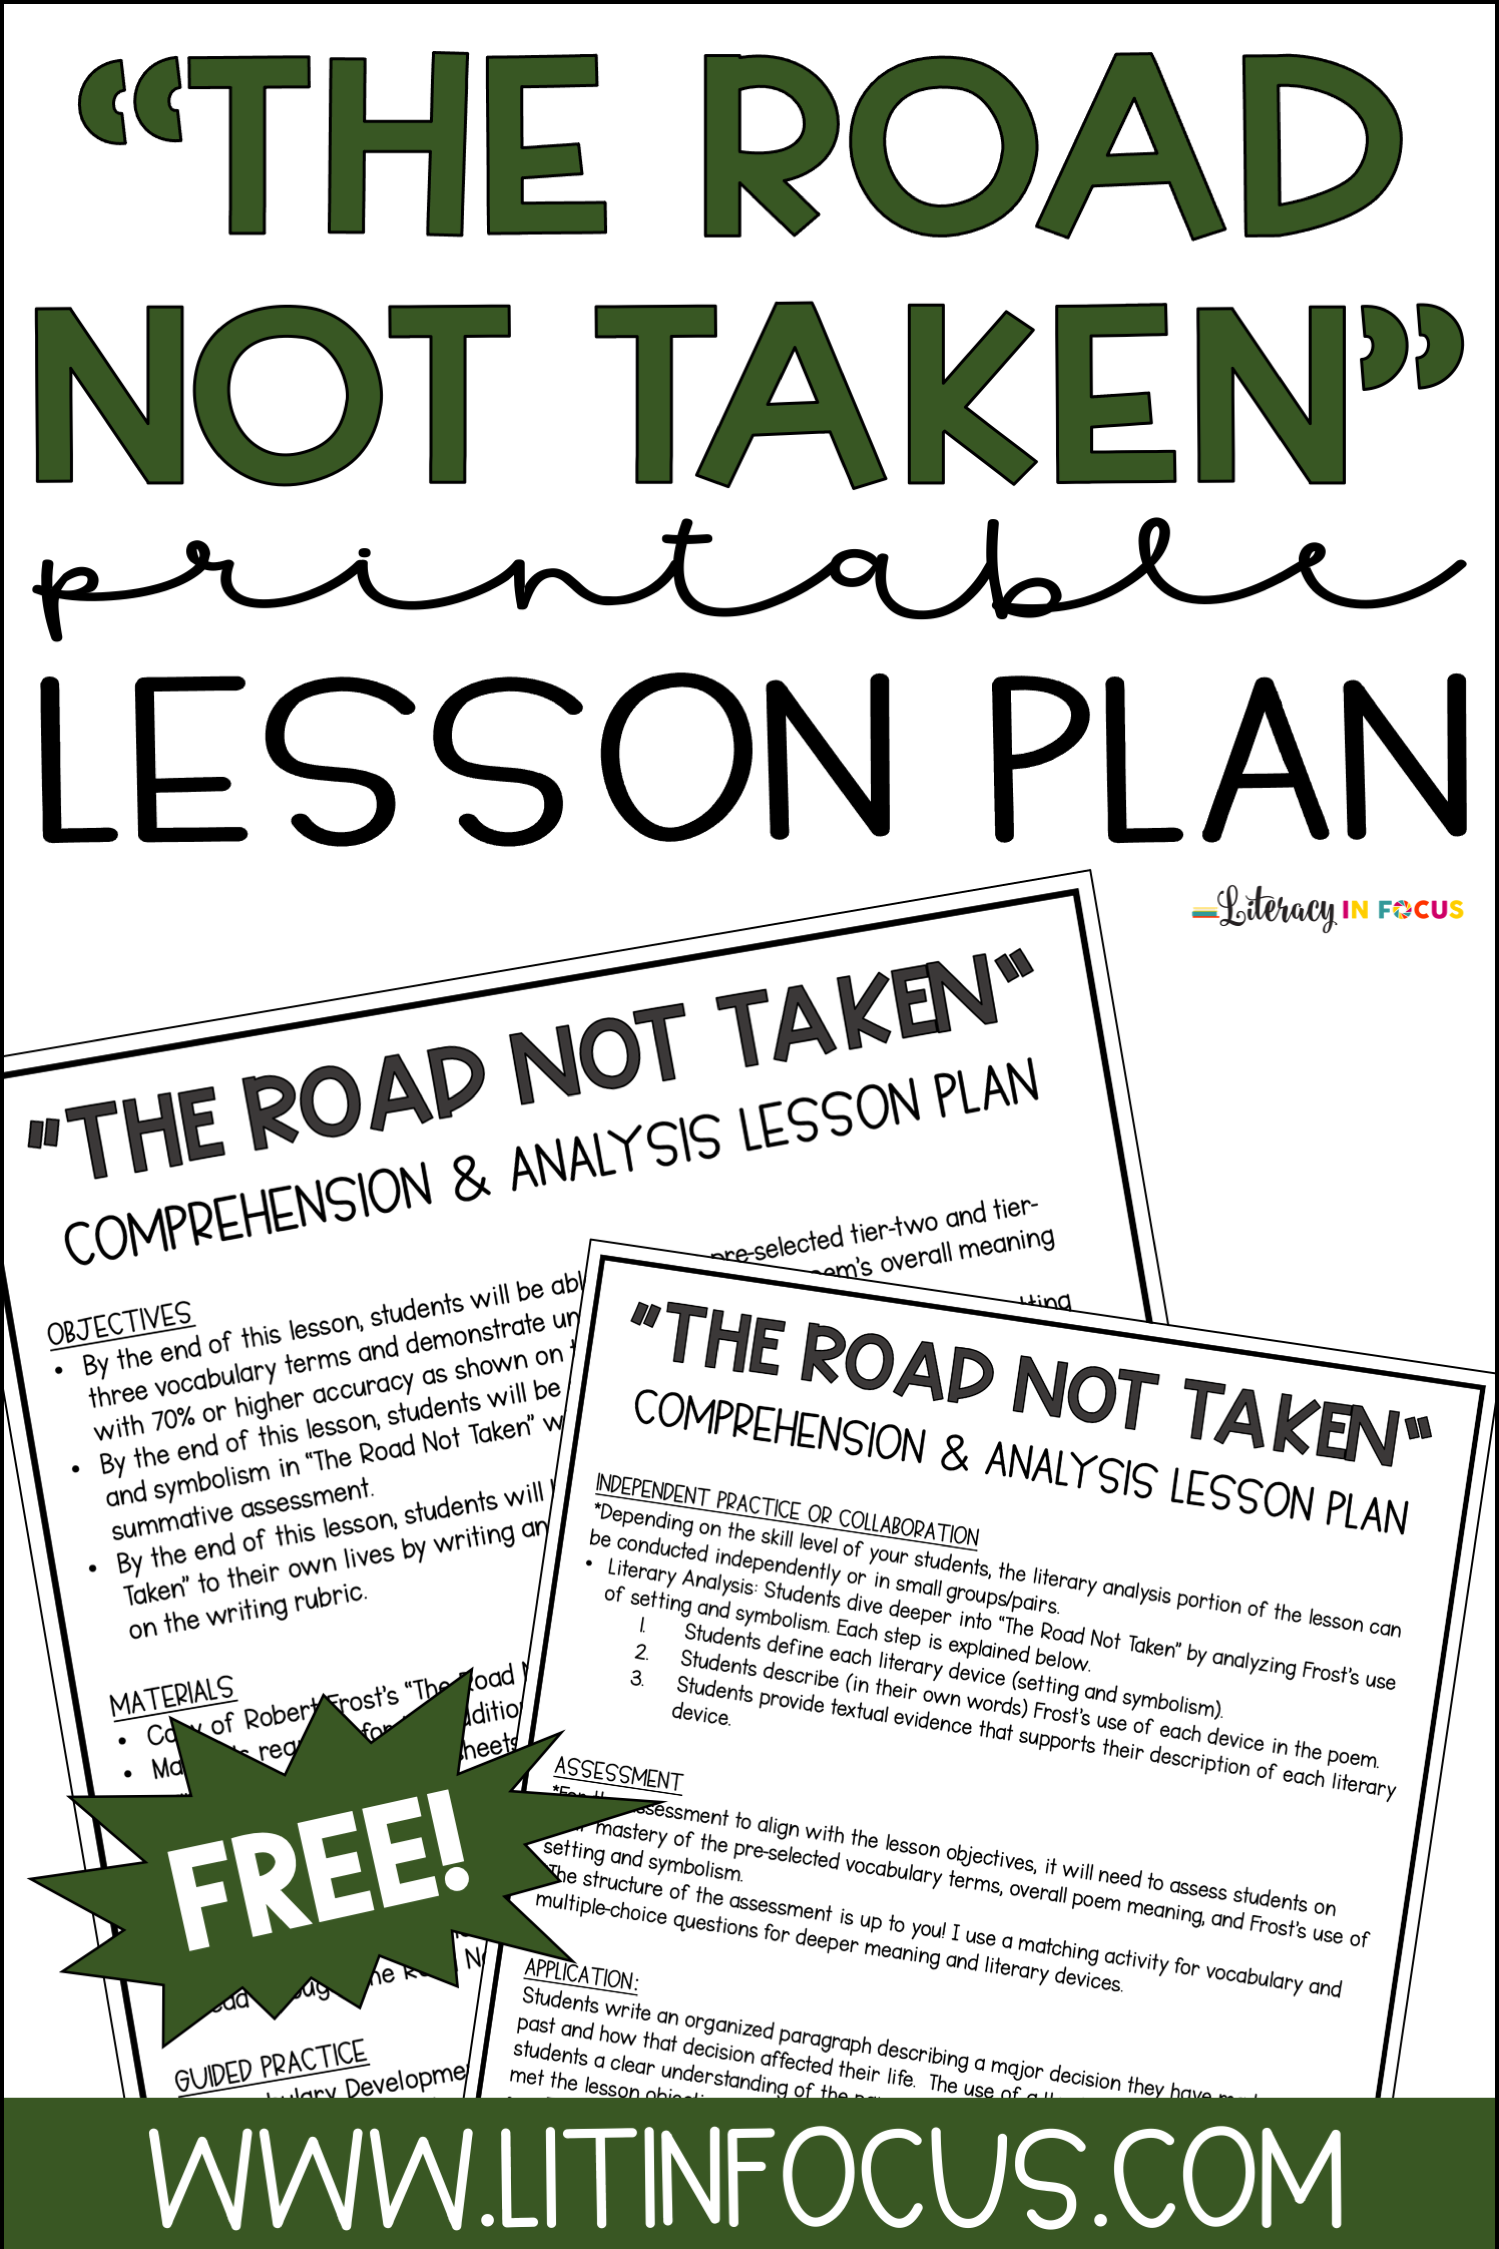 ROAD NOT Taken printable free lesson plan